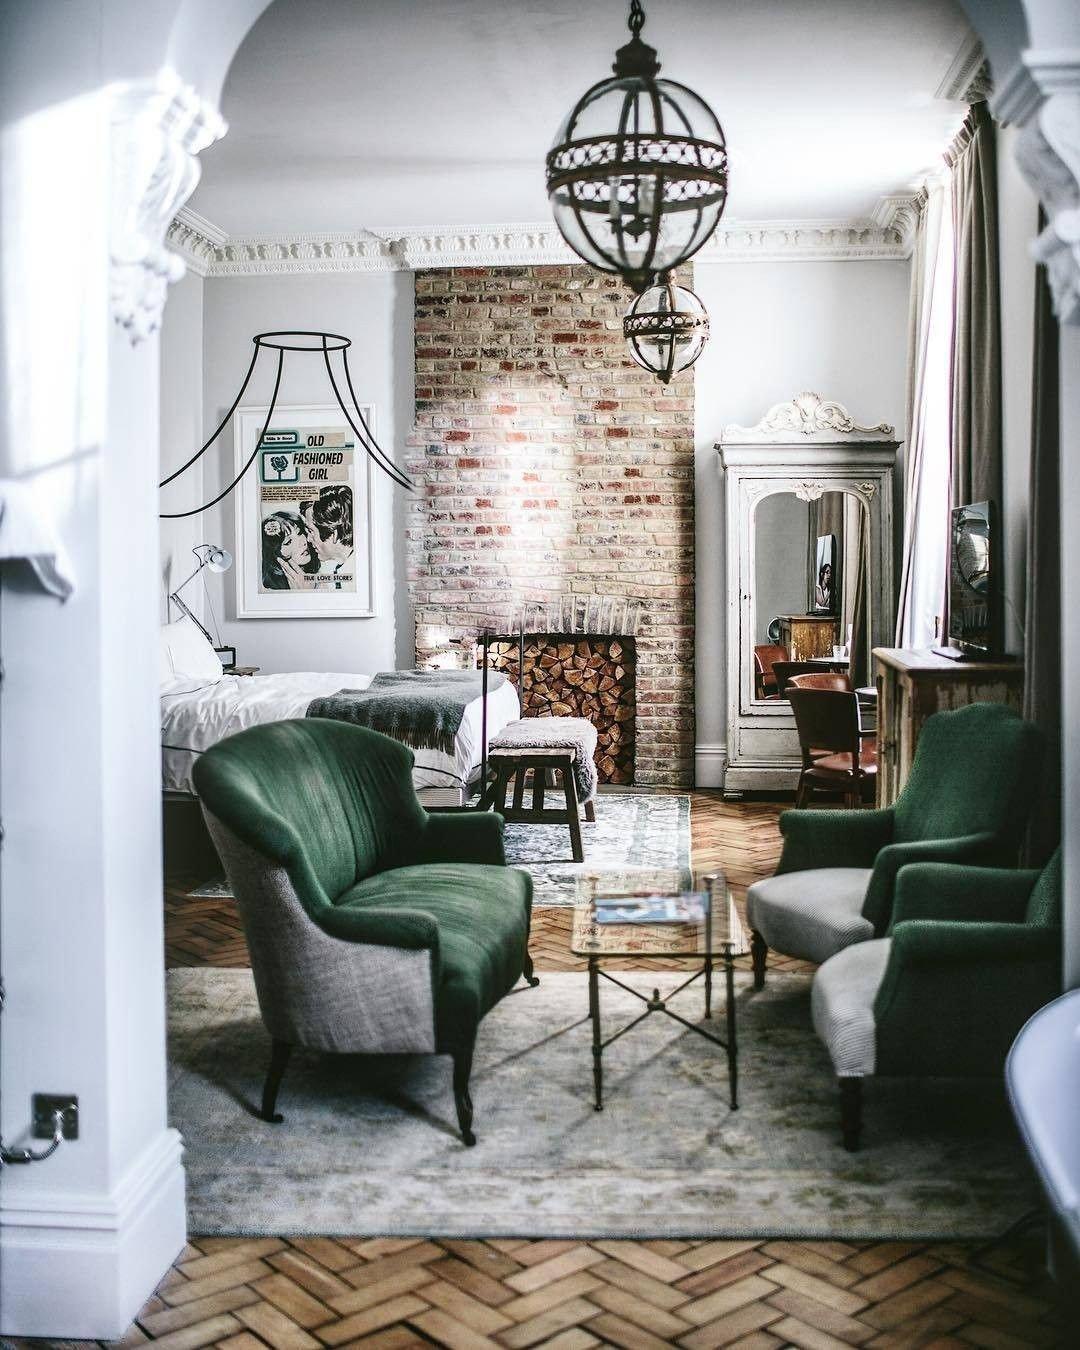 Bedroom Sitting area Ideas Beautiful Pin by Kat Sartorius On Decor Ideas